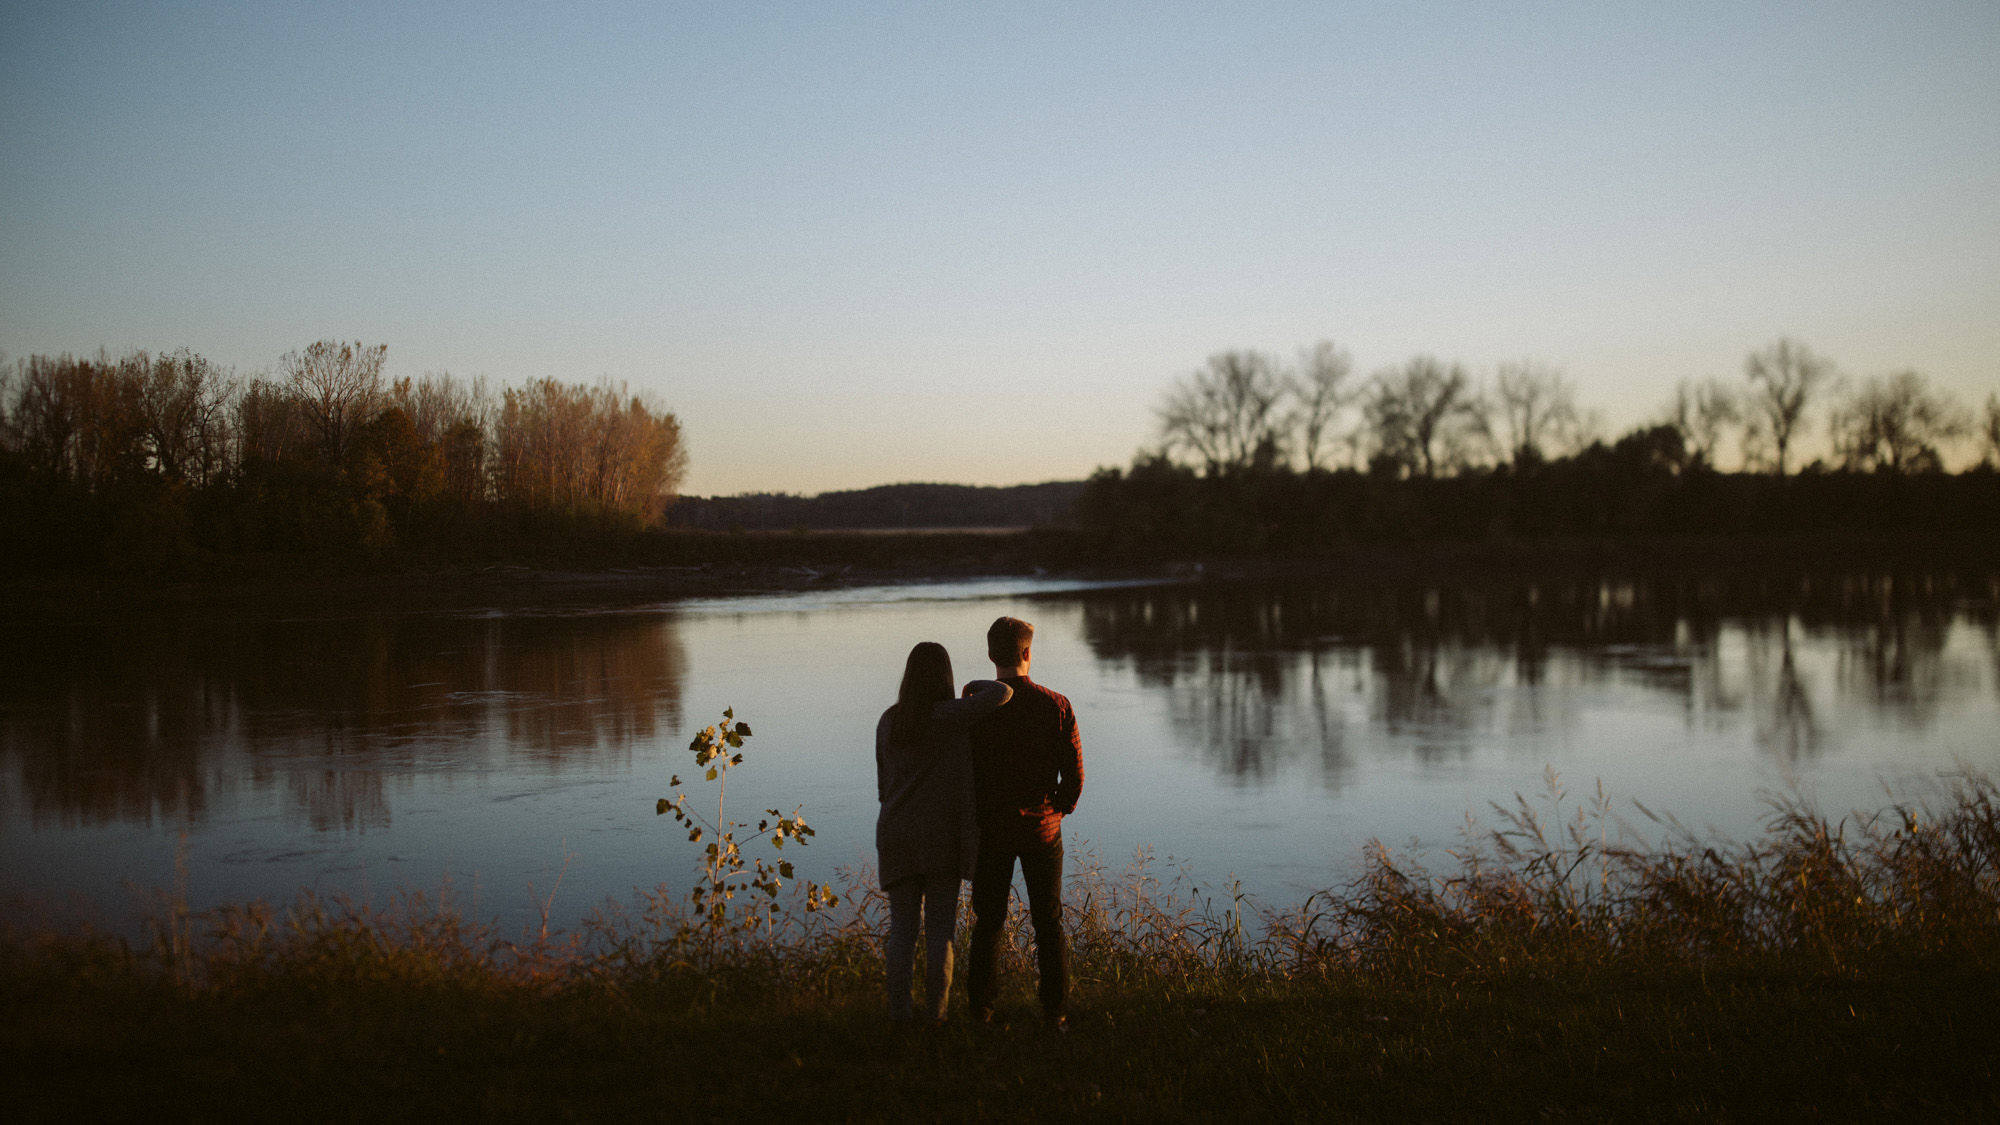 alec_vanderboom_Kansas_City_Engagement_Photos-0030.jpg